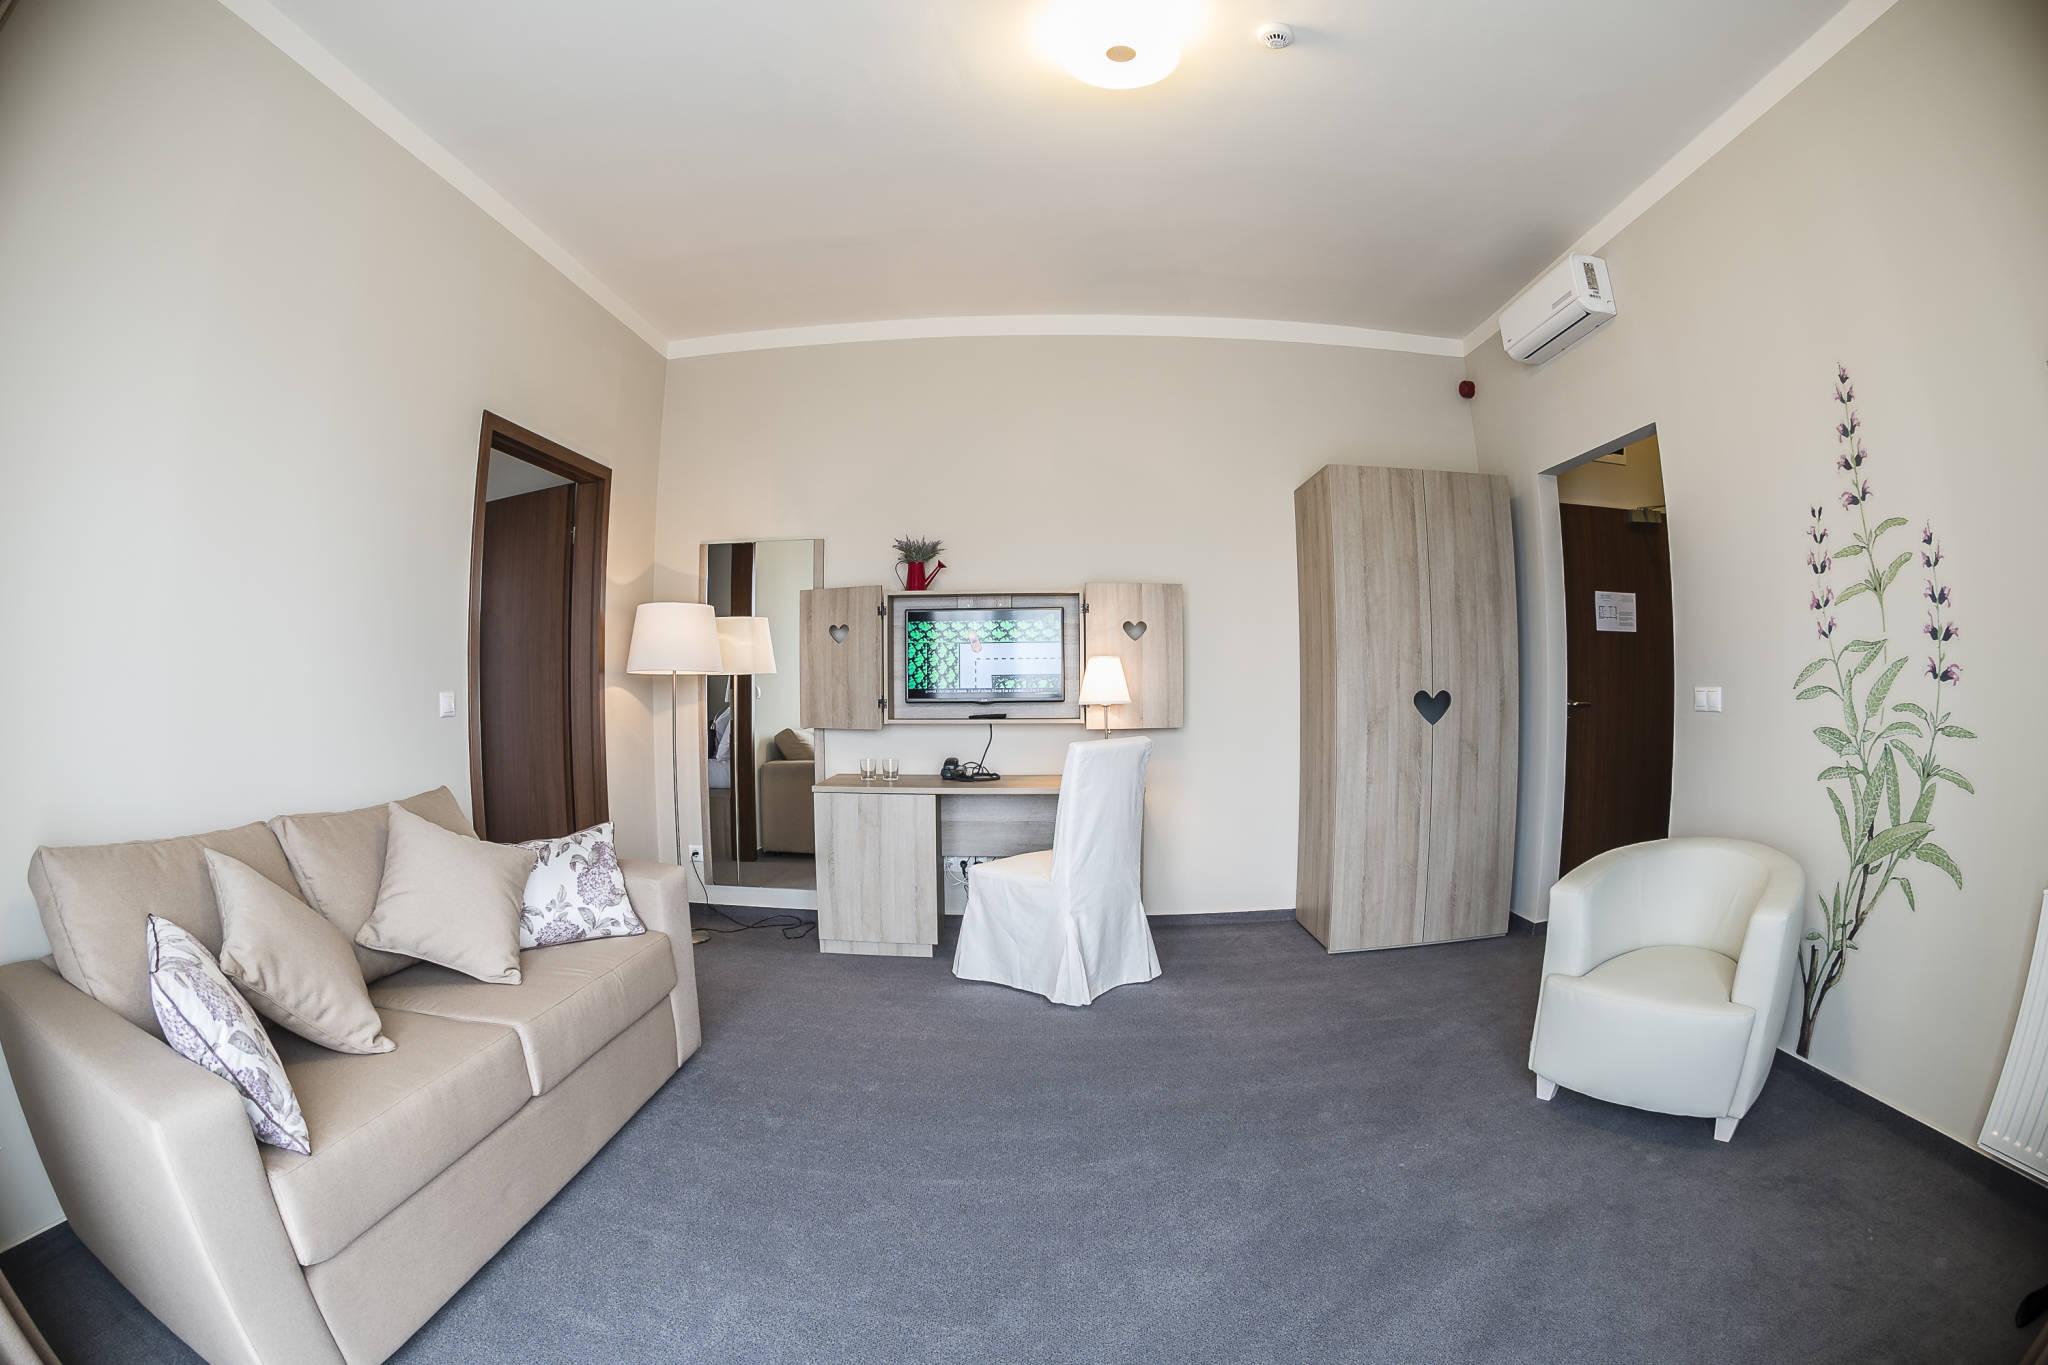 Levendula hotel algy for Appart hotel karlsruhe